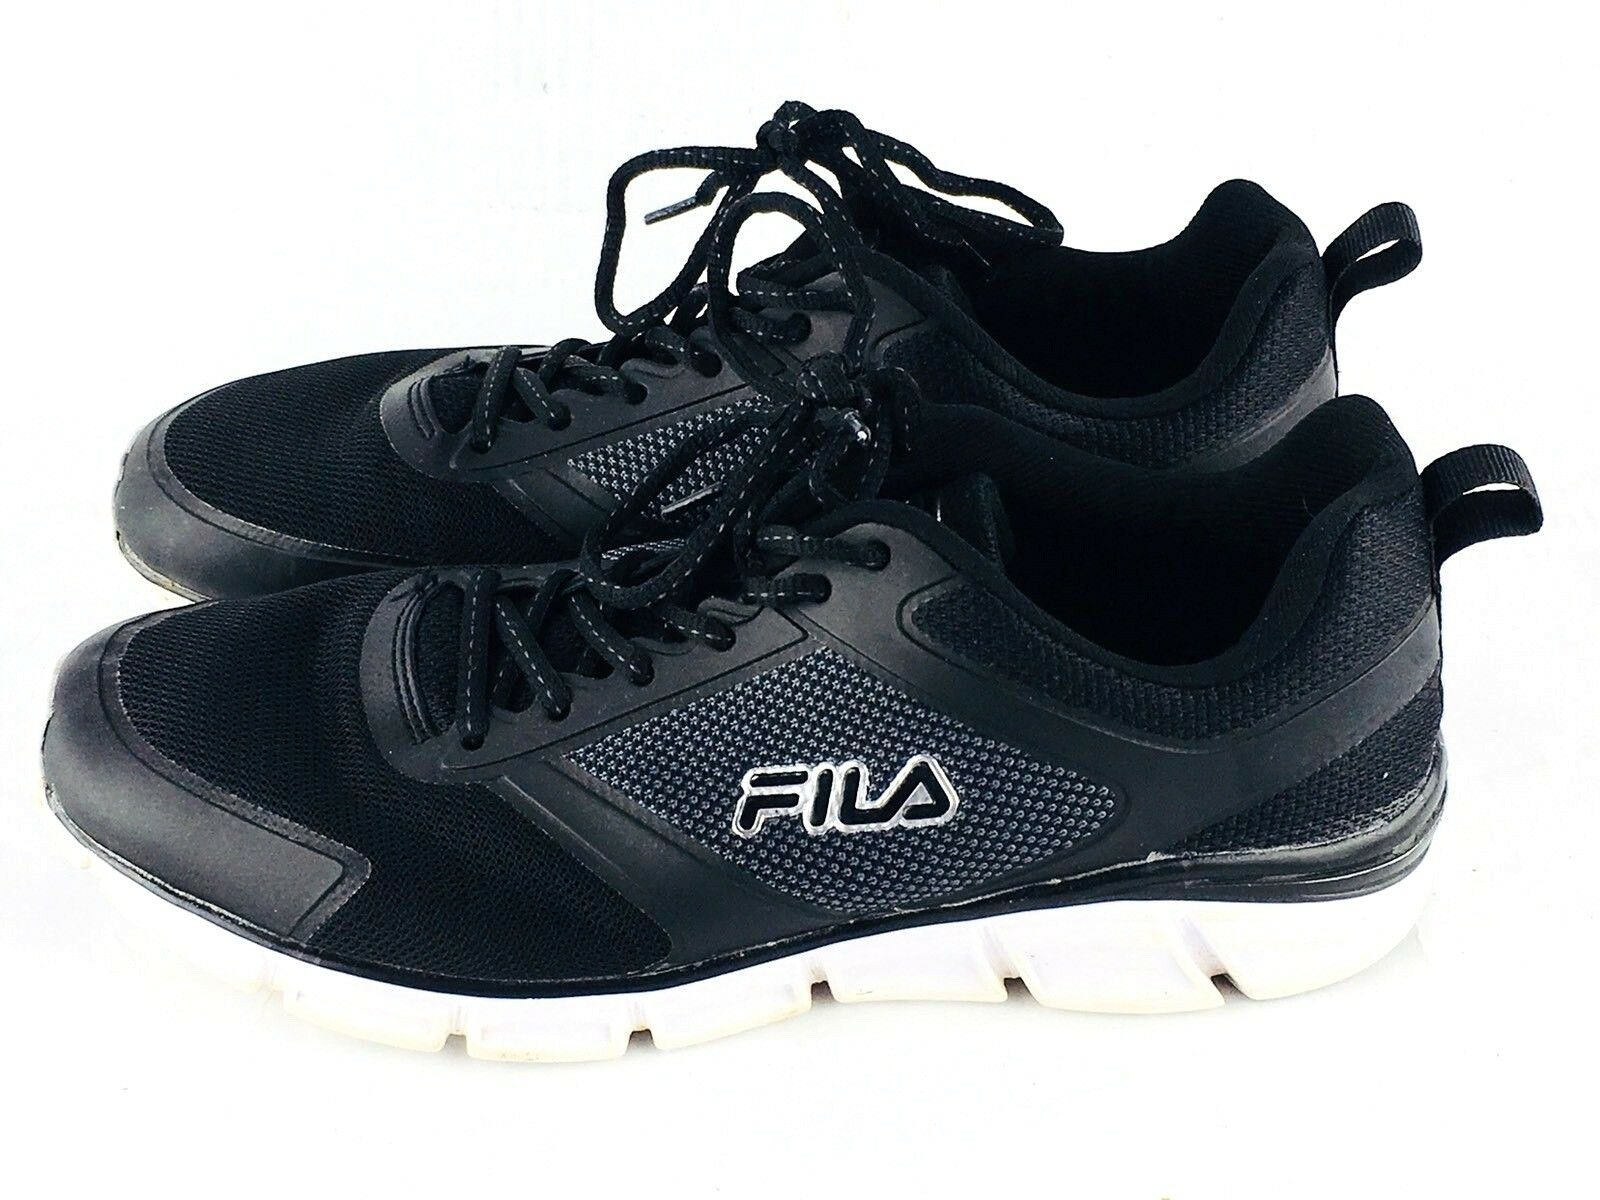 Fila Hombre 10 memoria steelsprint Foam Negro Zapatos Negro Foam Athletic 4d44ba